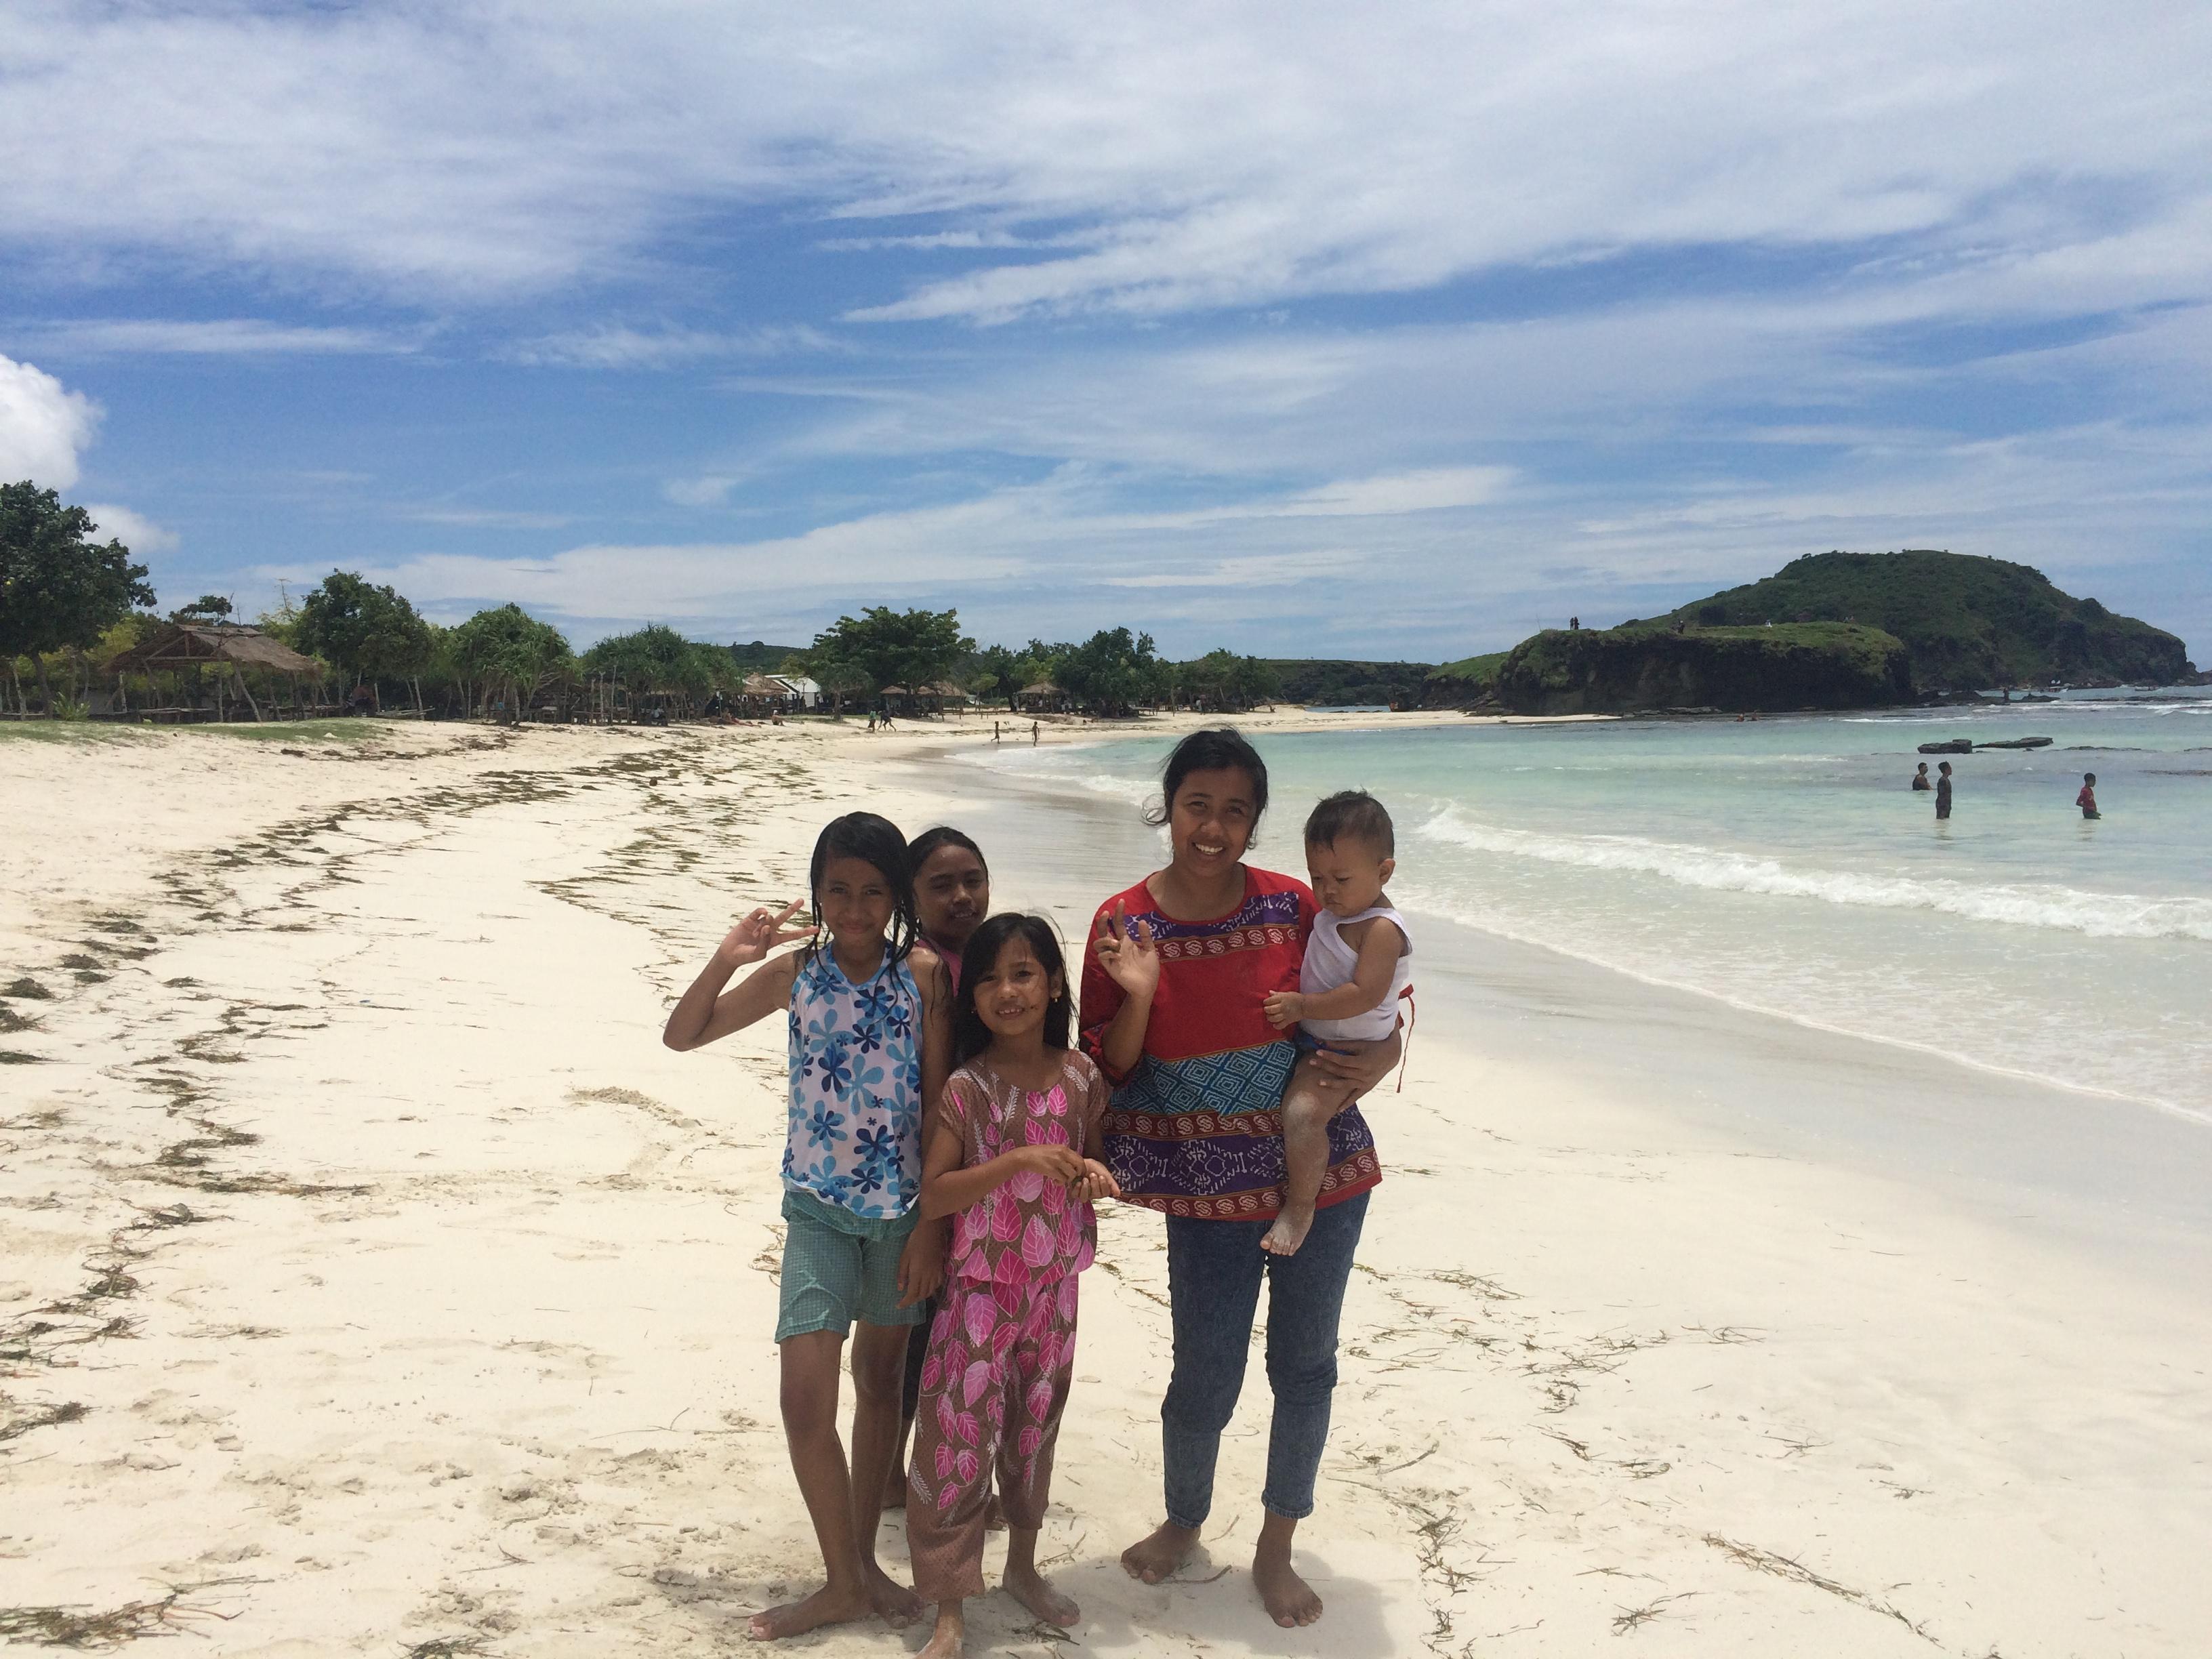 Indonésie, Lombok, plage de sable blanc TAJUNGANN